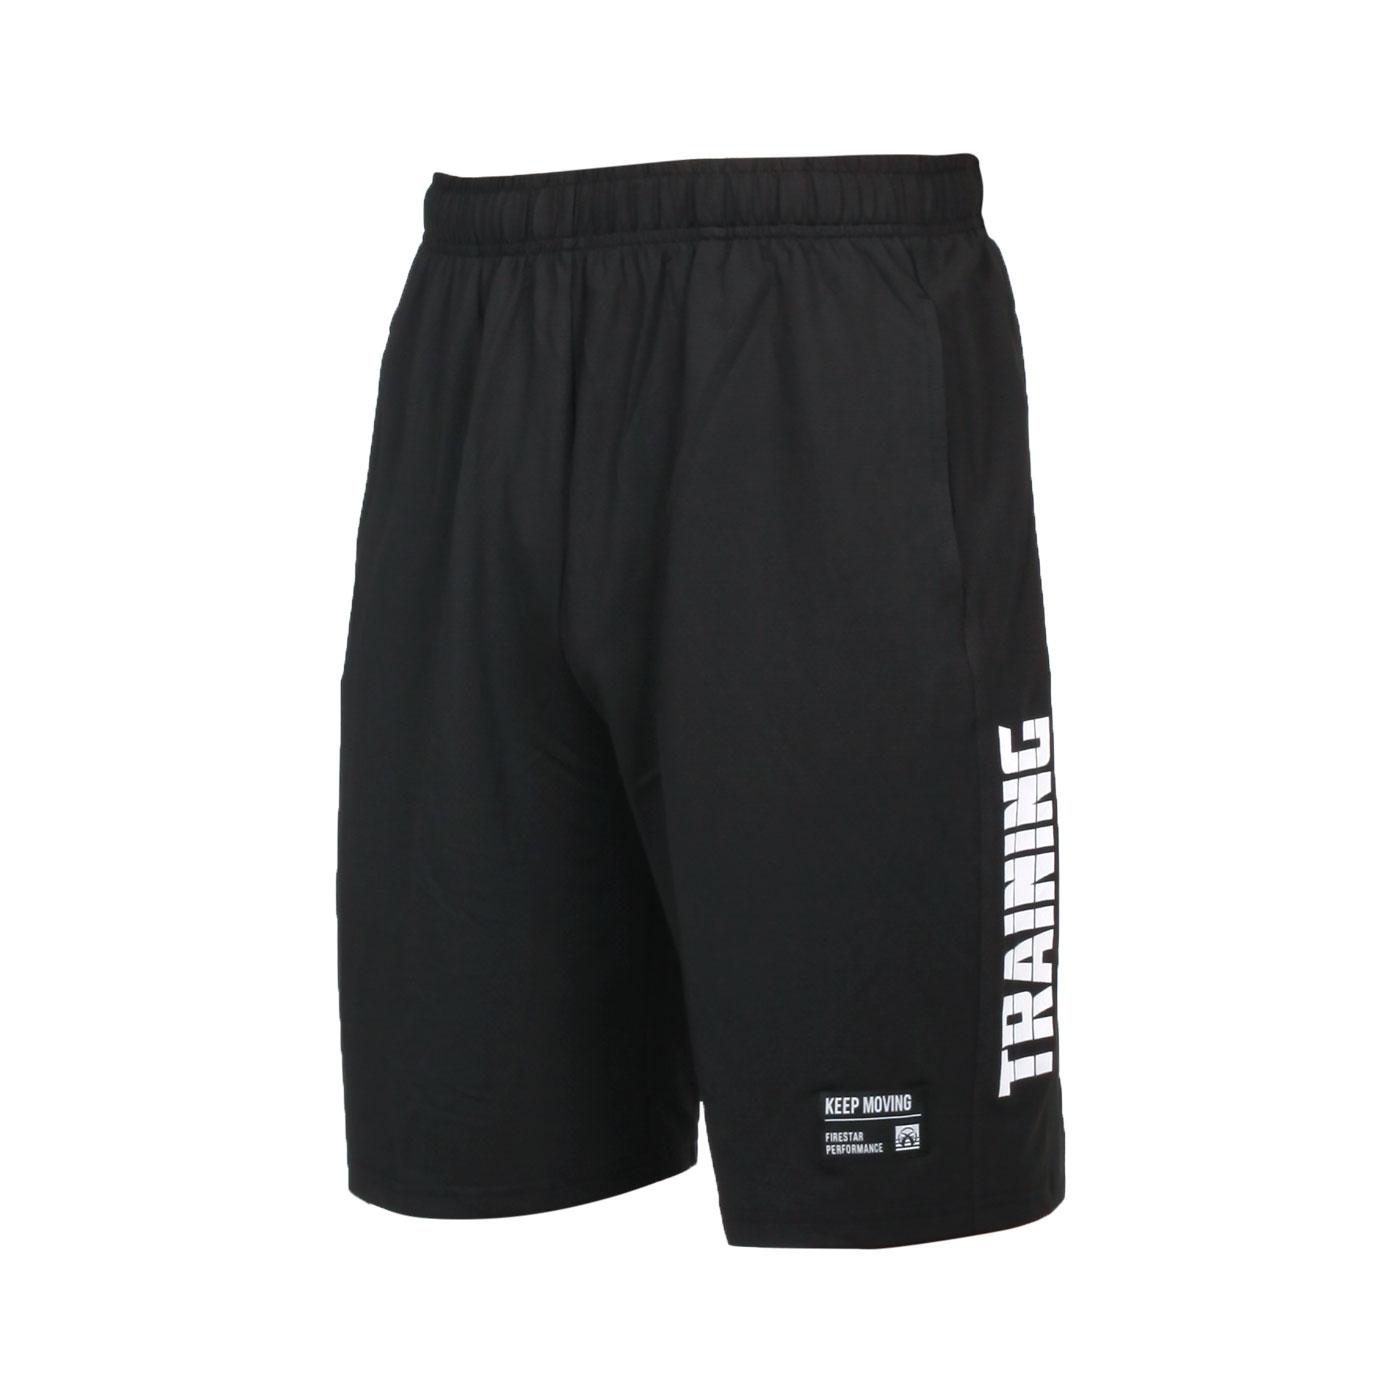 FIRESTAR 男款彈性訓練籃球短褲 B1703-20 - 黑白